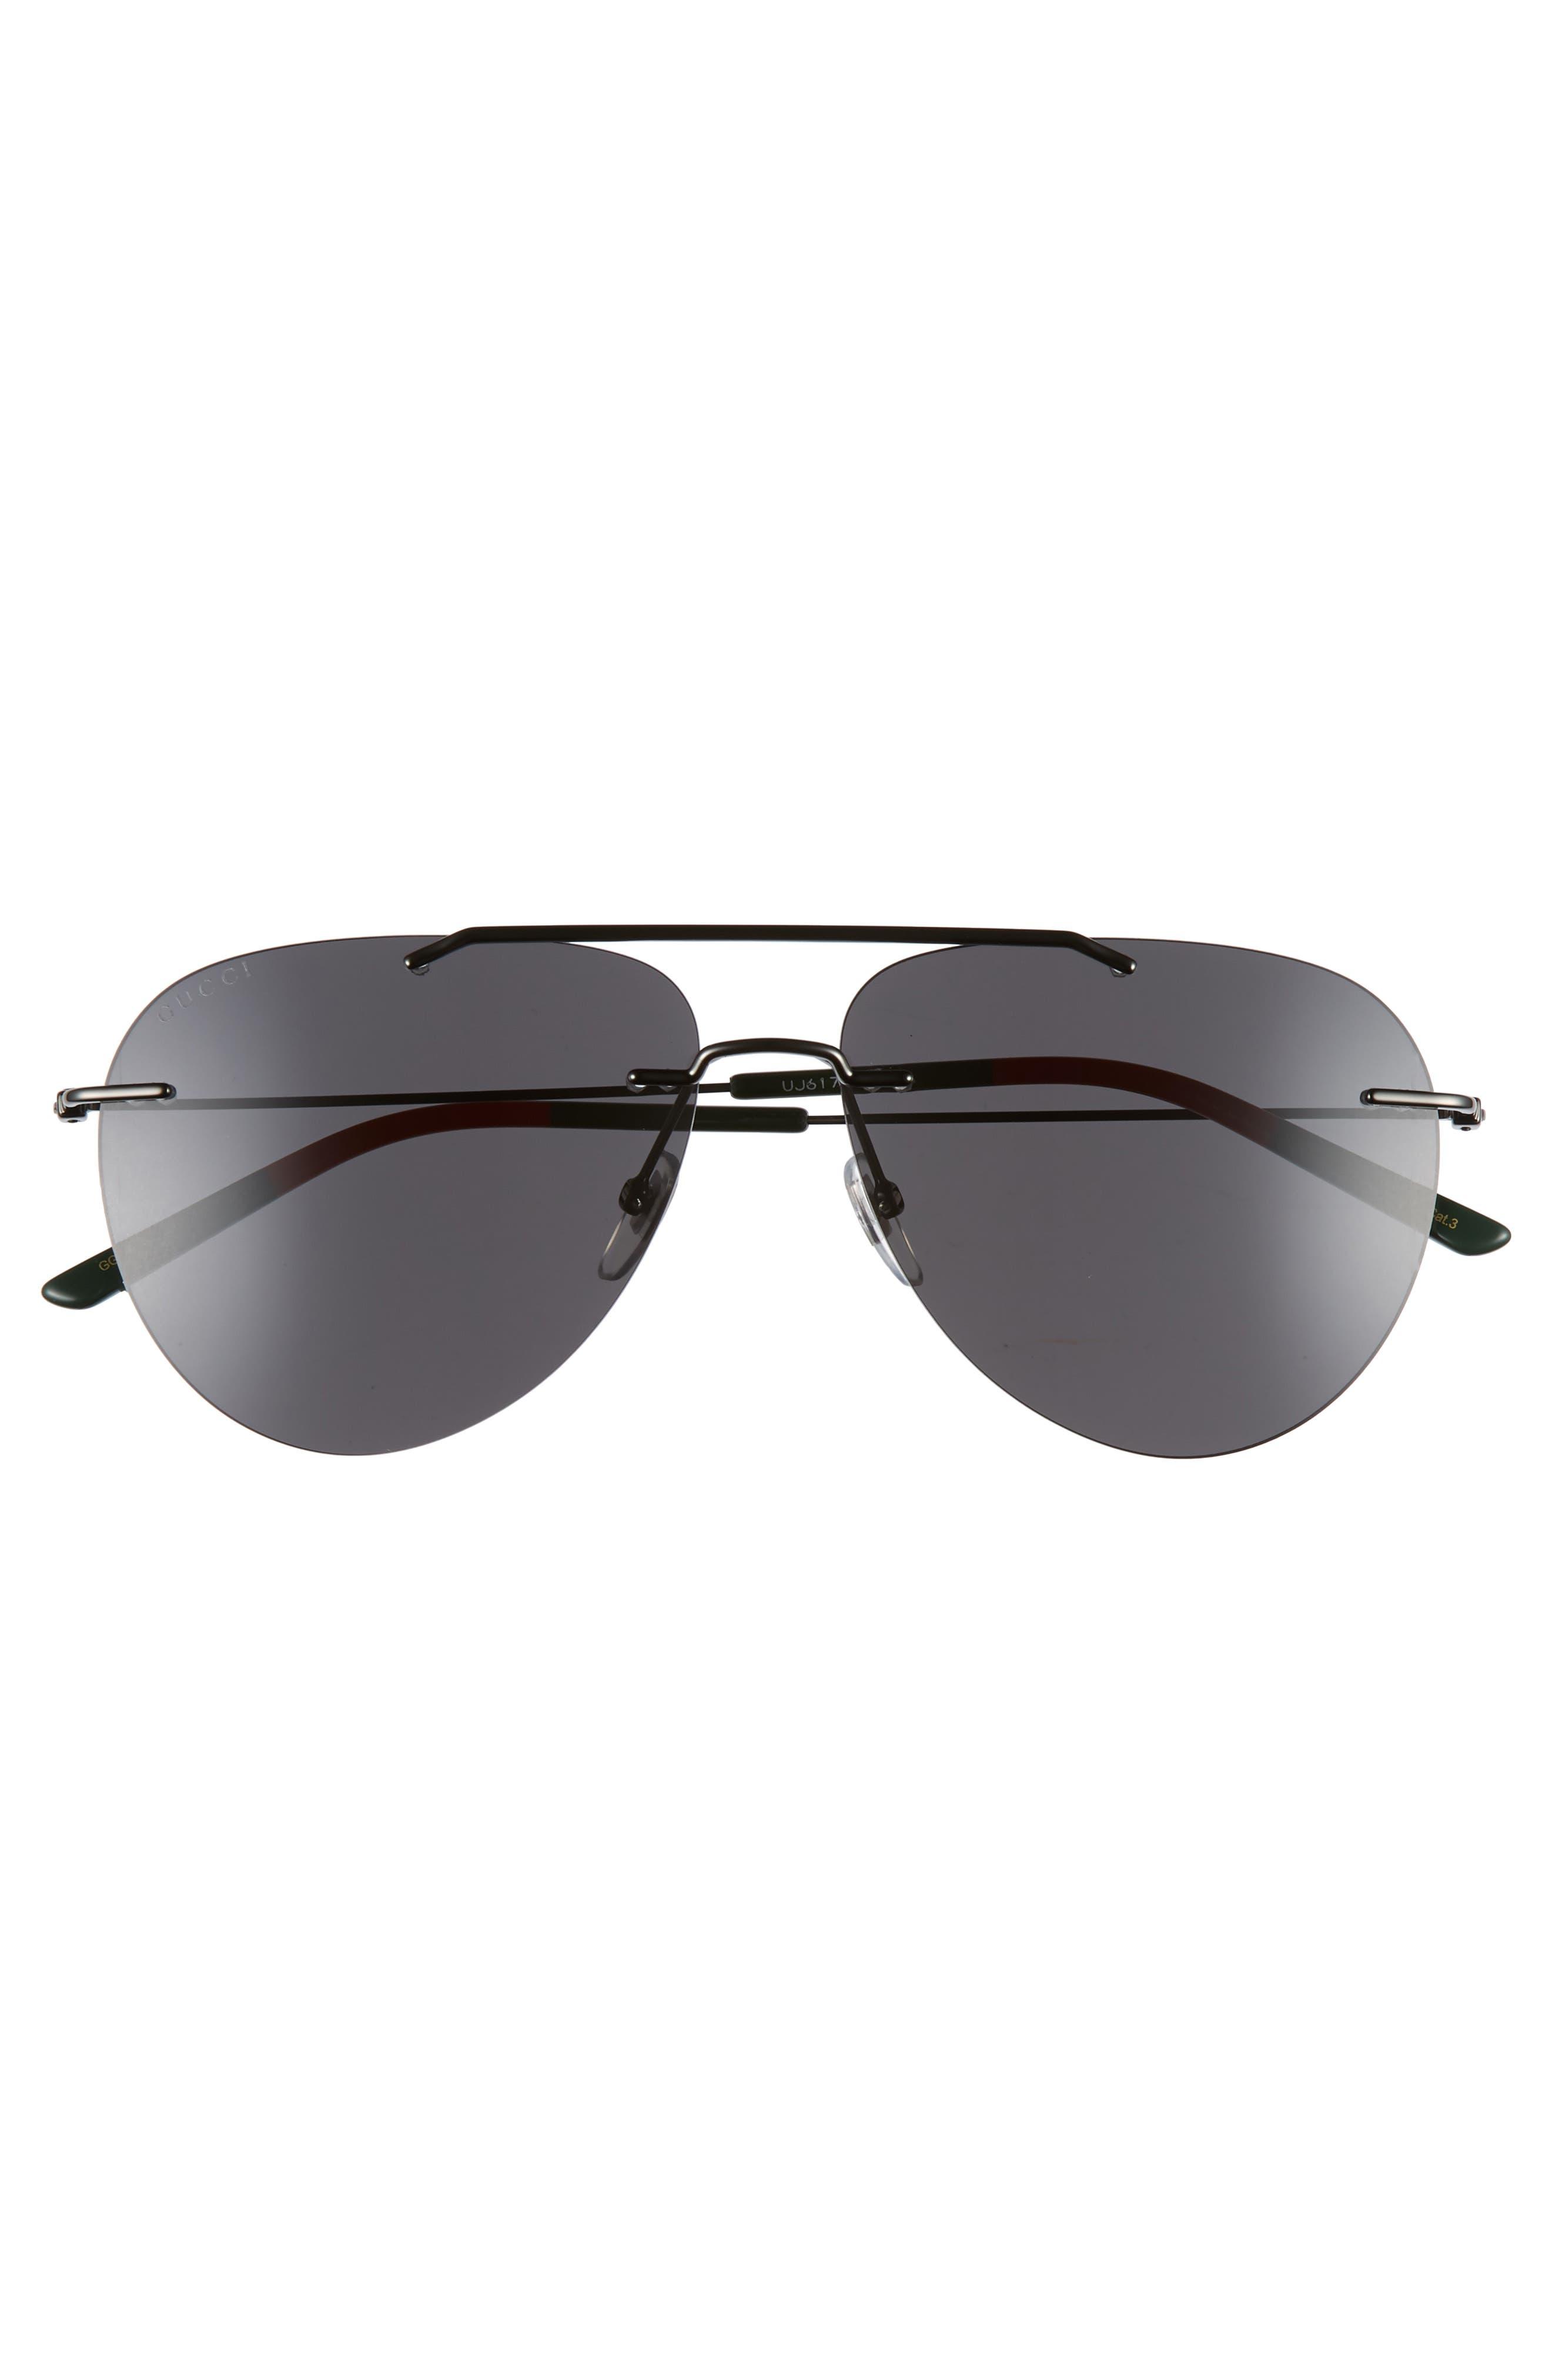 GUCCI, 60mm Rimless Aviator Sunglasses, Alternate thumbnail 2, color, RUTHENIUM